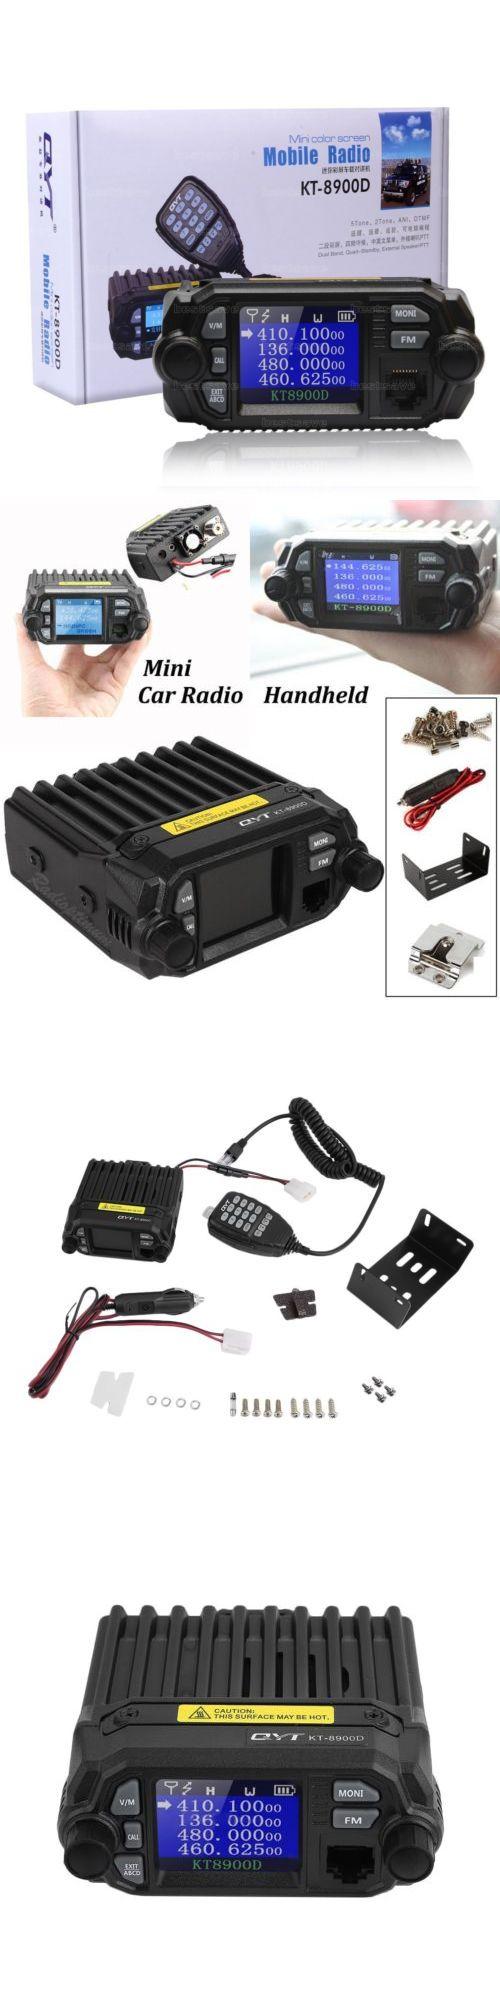 Ham Radio Transceivers: Qyt Kt-8900D Dual Band Vhf Uhf 25 Watt Quad-Standy Car Mobile Fm Radio Mic 25W -> BUY IT NOW ONLY: $75.48 on eBay!